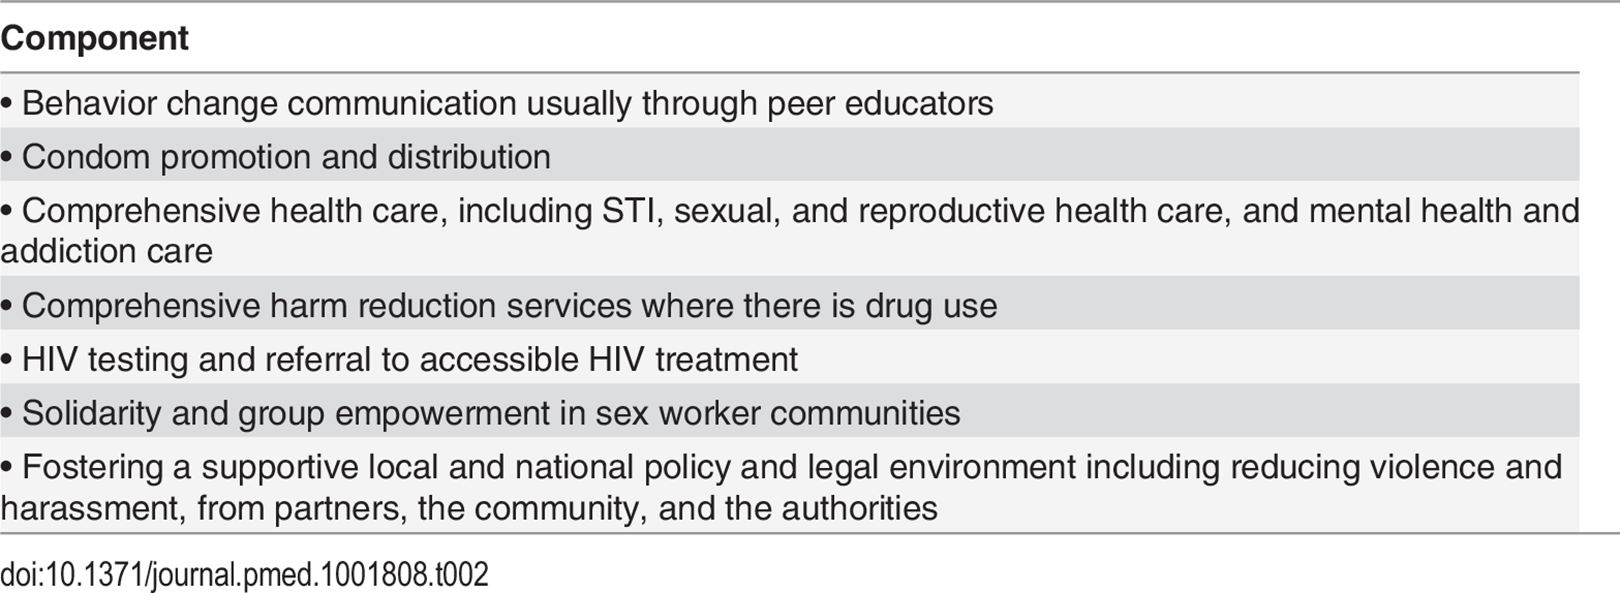 Components of a comprehensive sex worker HIV prevention program.